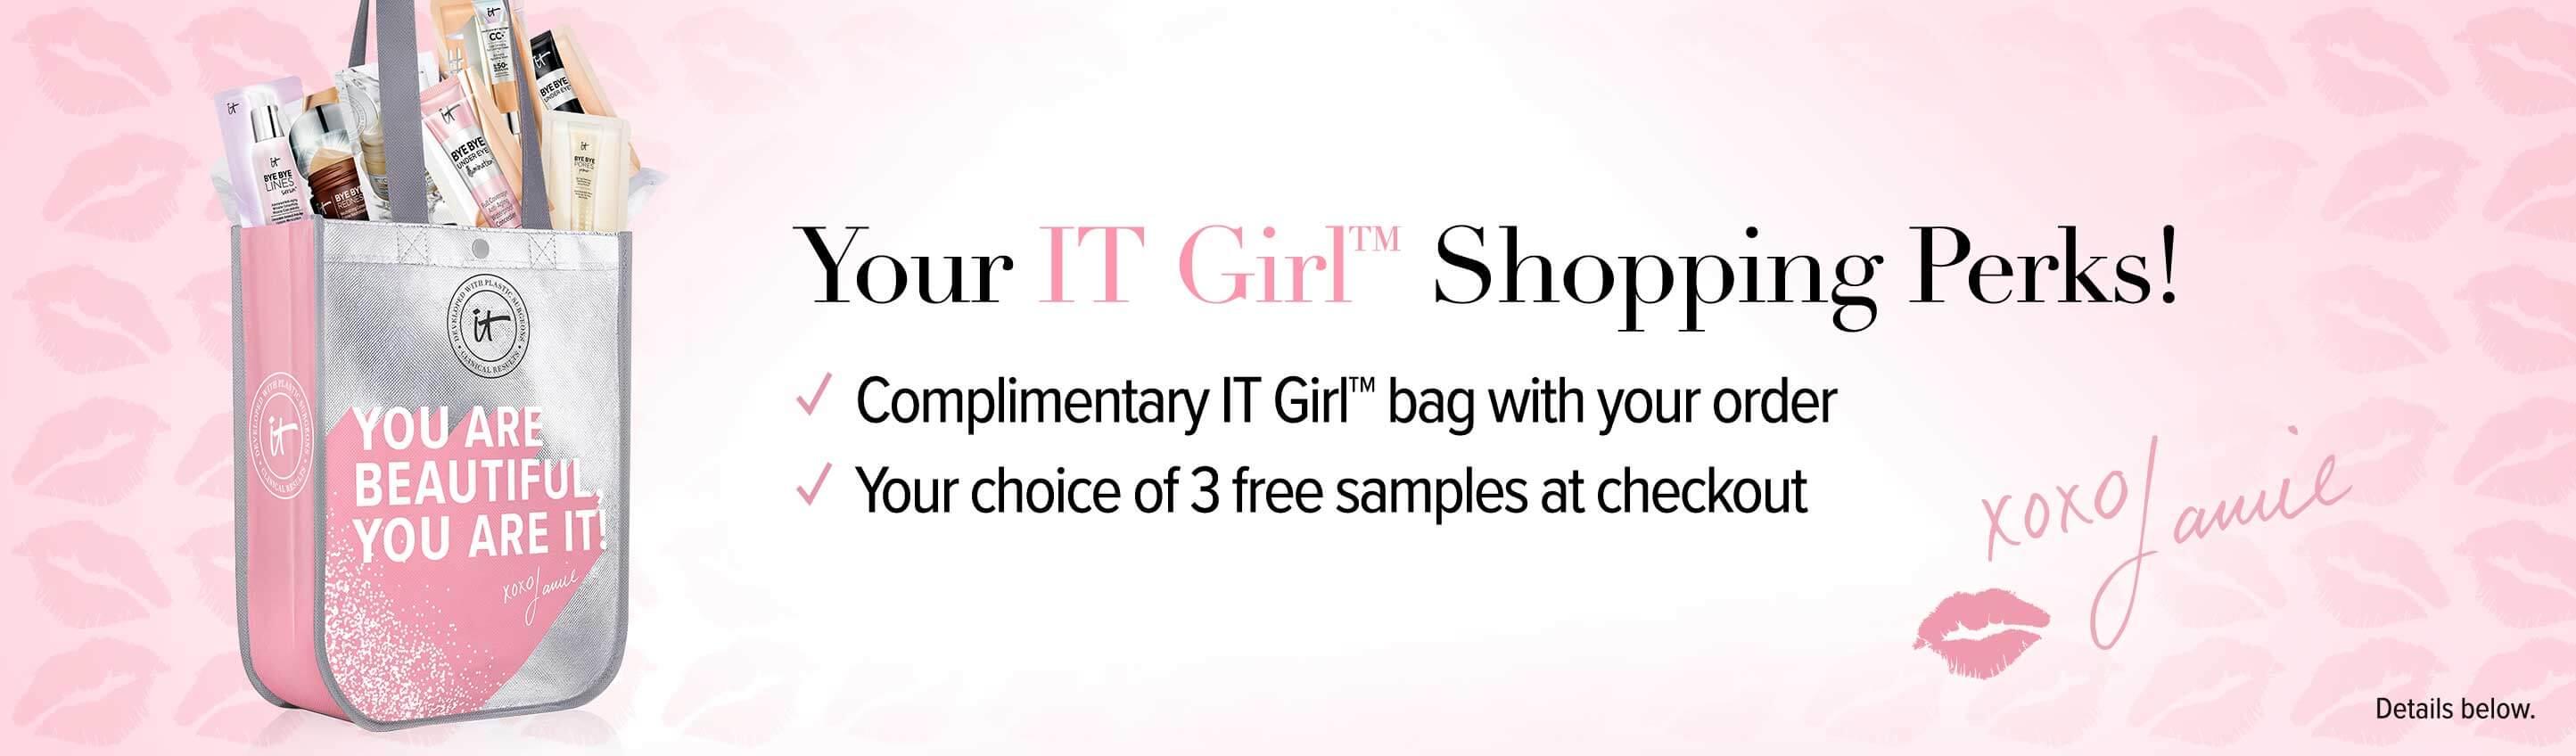 New customer qvc promo code - It Girl Perks